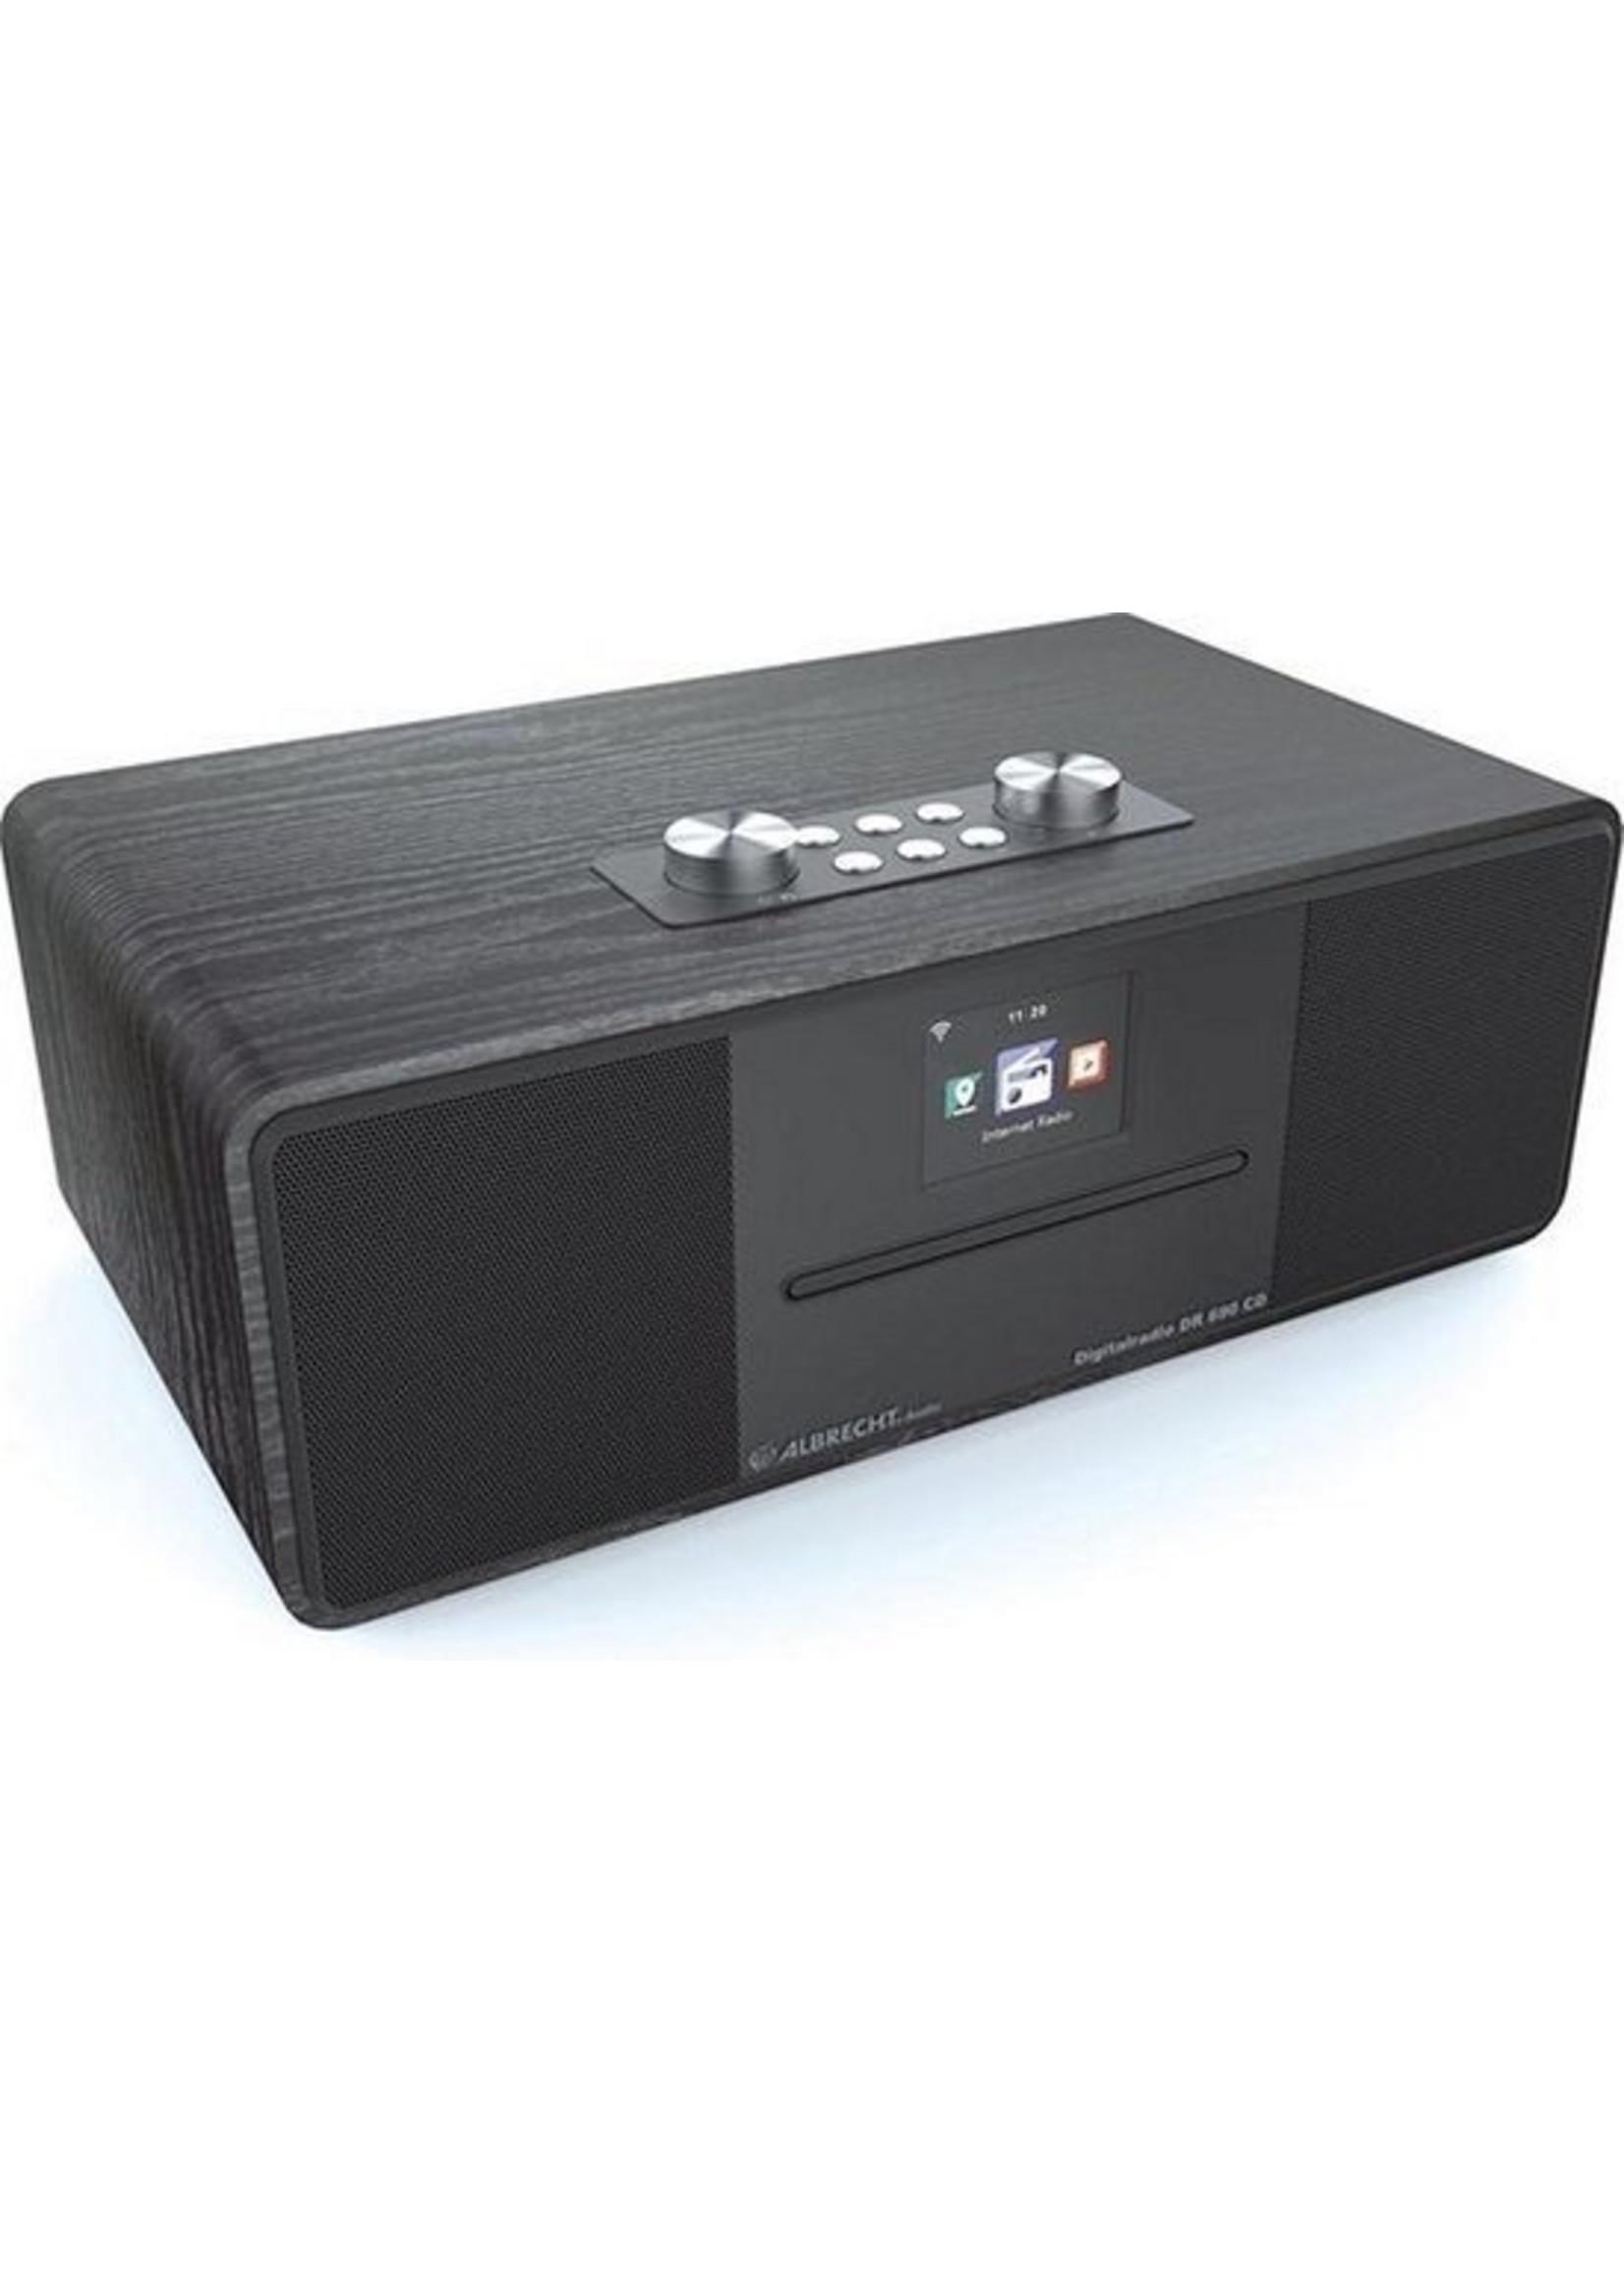 Albrecht Albrecht DR 690 hybrideradio - CD-speler - DAB  en FM- internetradio met bluetooth, zwart